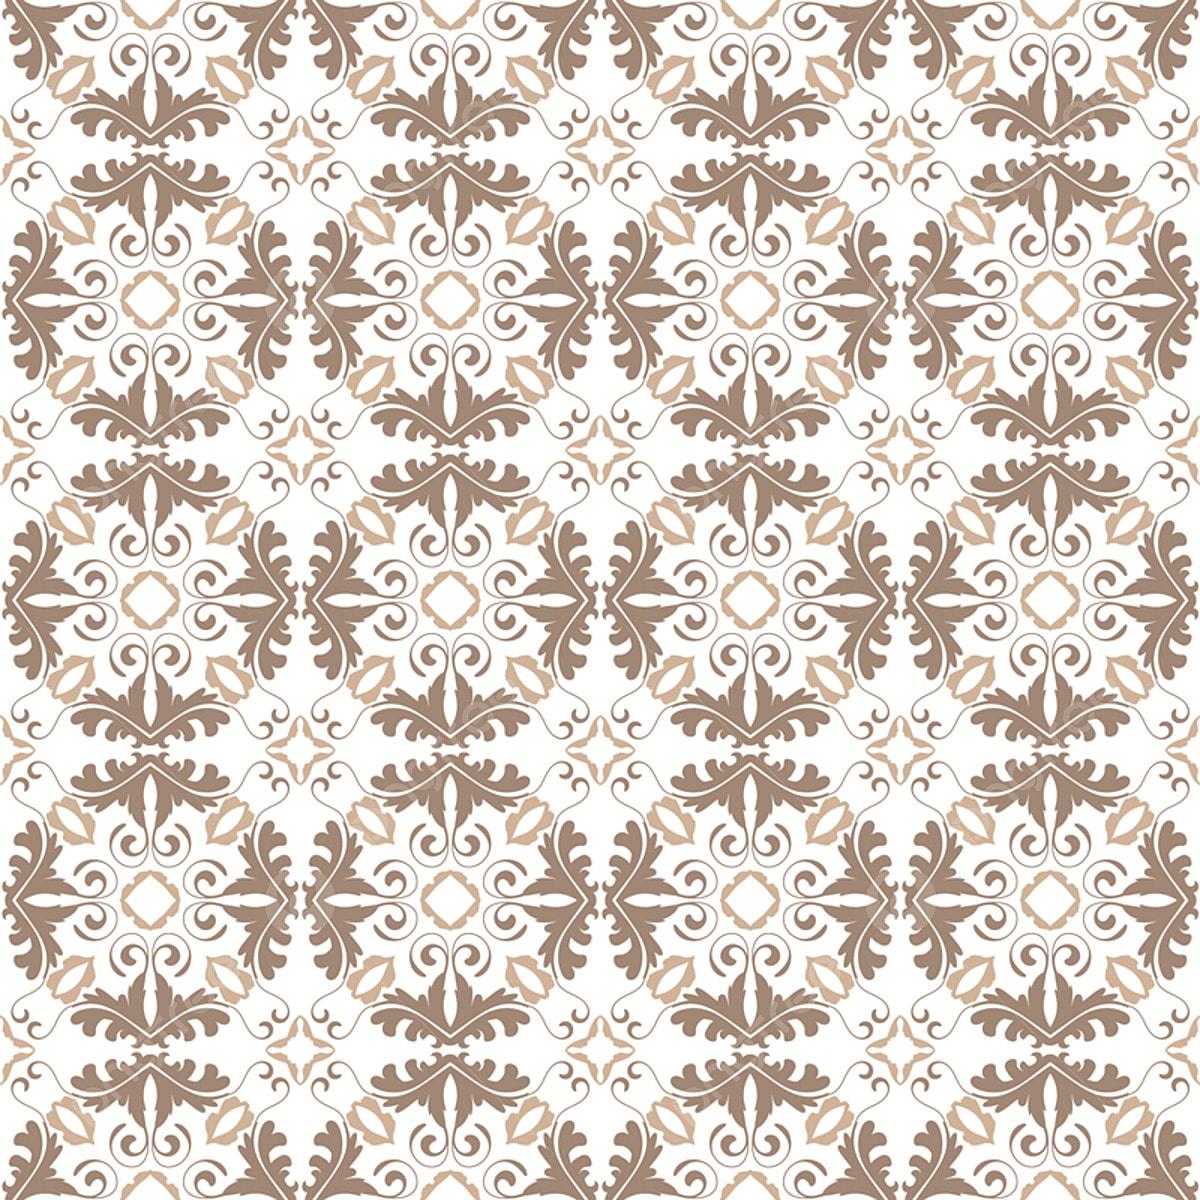 Floral Pattern Wallpaper Baroque Damask Seamless Vector